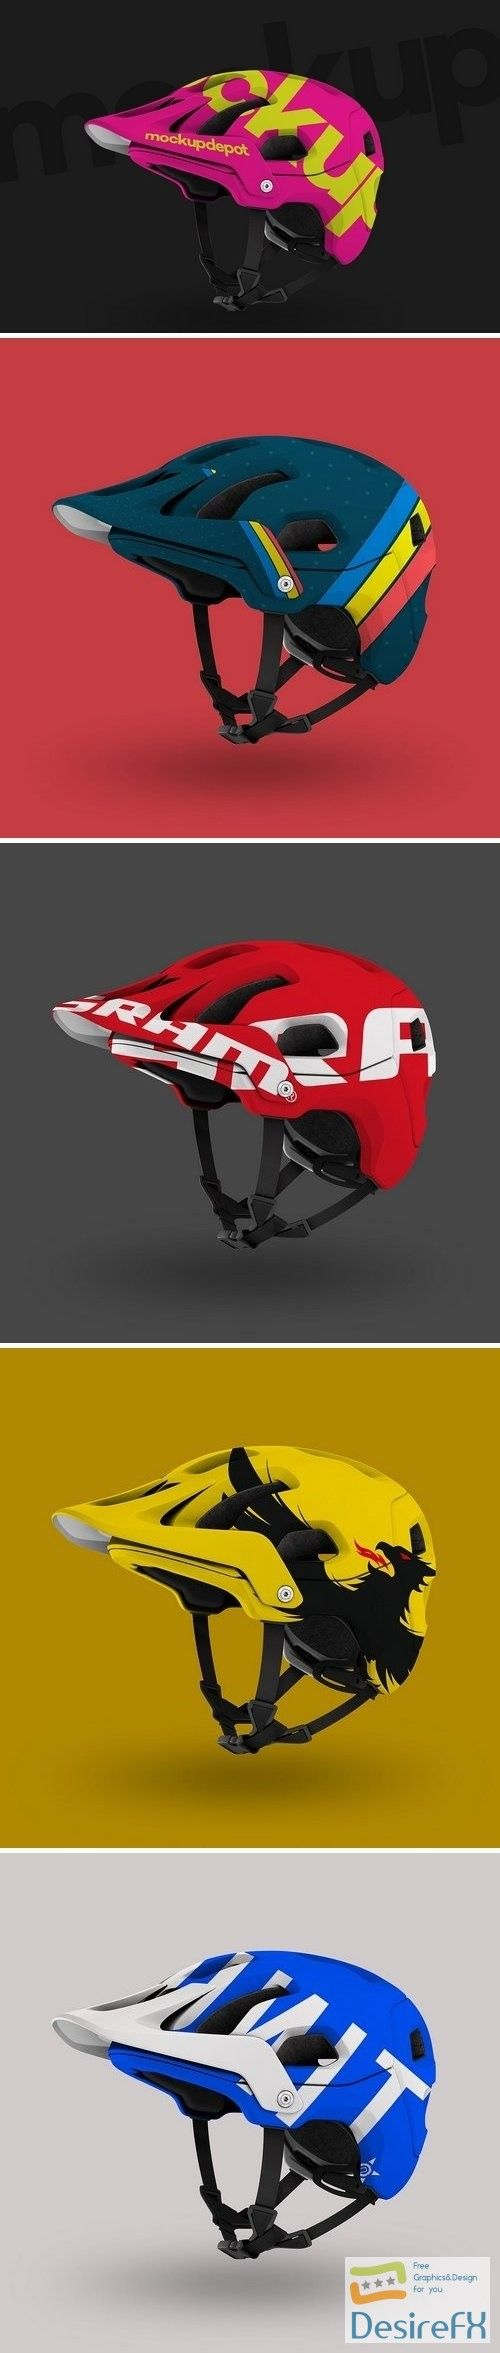 Download Download 4k Mountain Bike Helmet Psd Mockup 1541901 Desirefx Com Mountain Bike Helmets Bike Helmet Mockup Psd